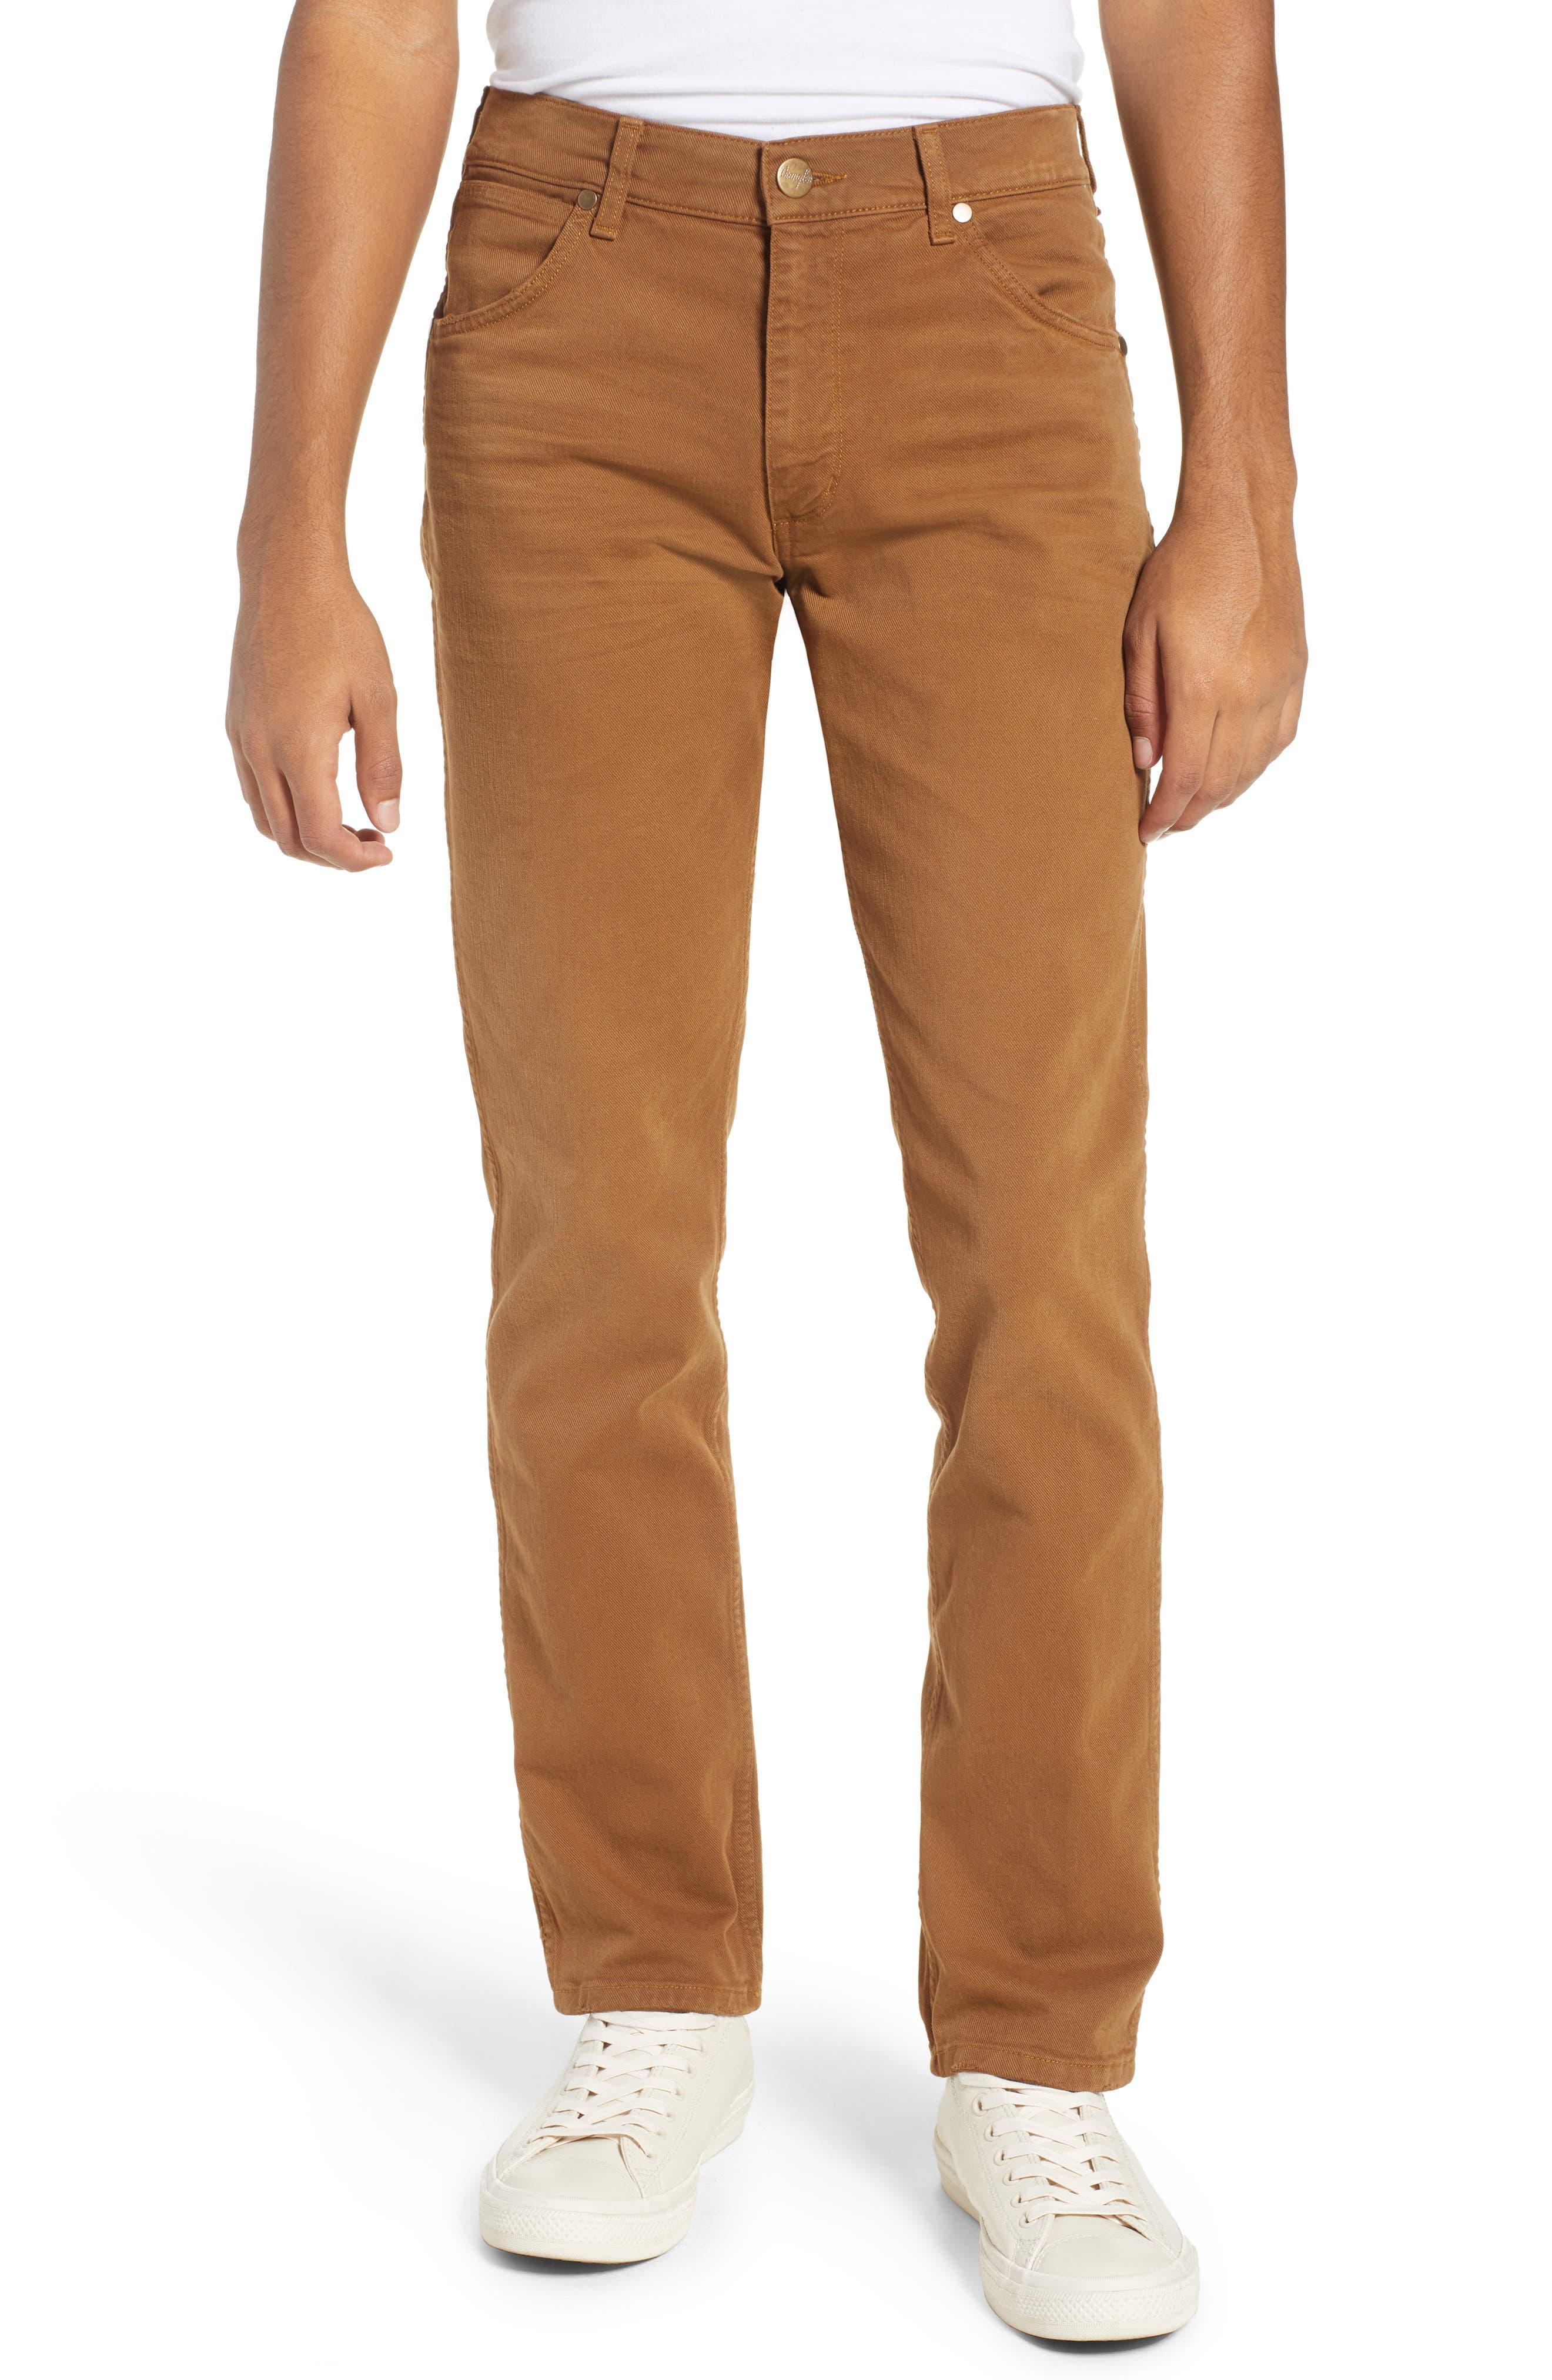 WRANGLER Greensboro Straight Leg Pants, Main, color, BISCUIT